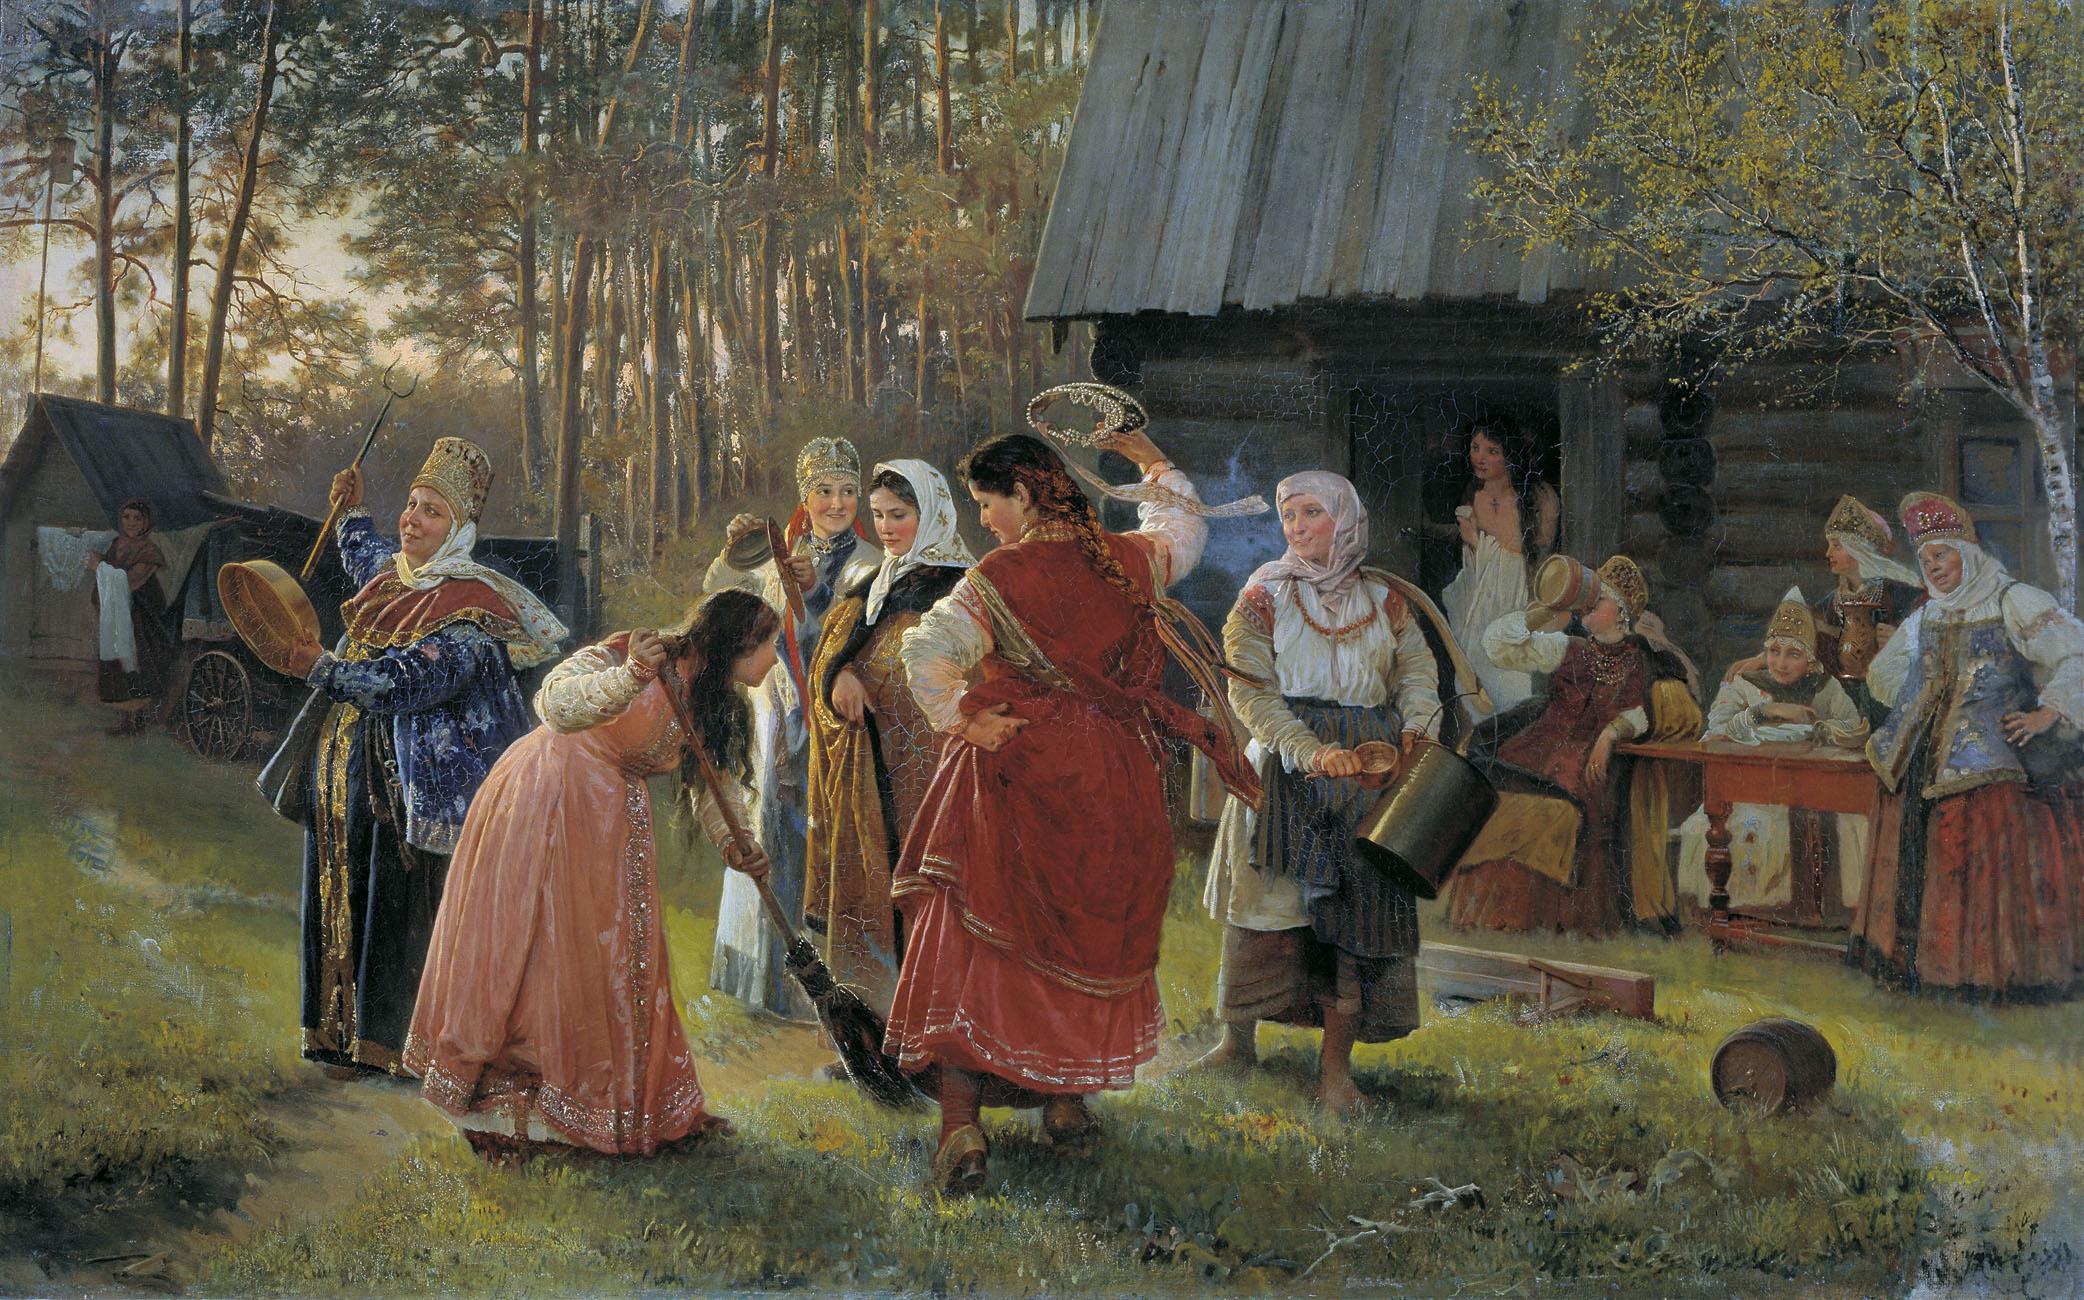 Файл:AlexeyKorzukhin GirlyBBQ 1889.jpg